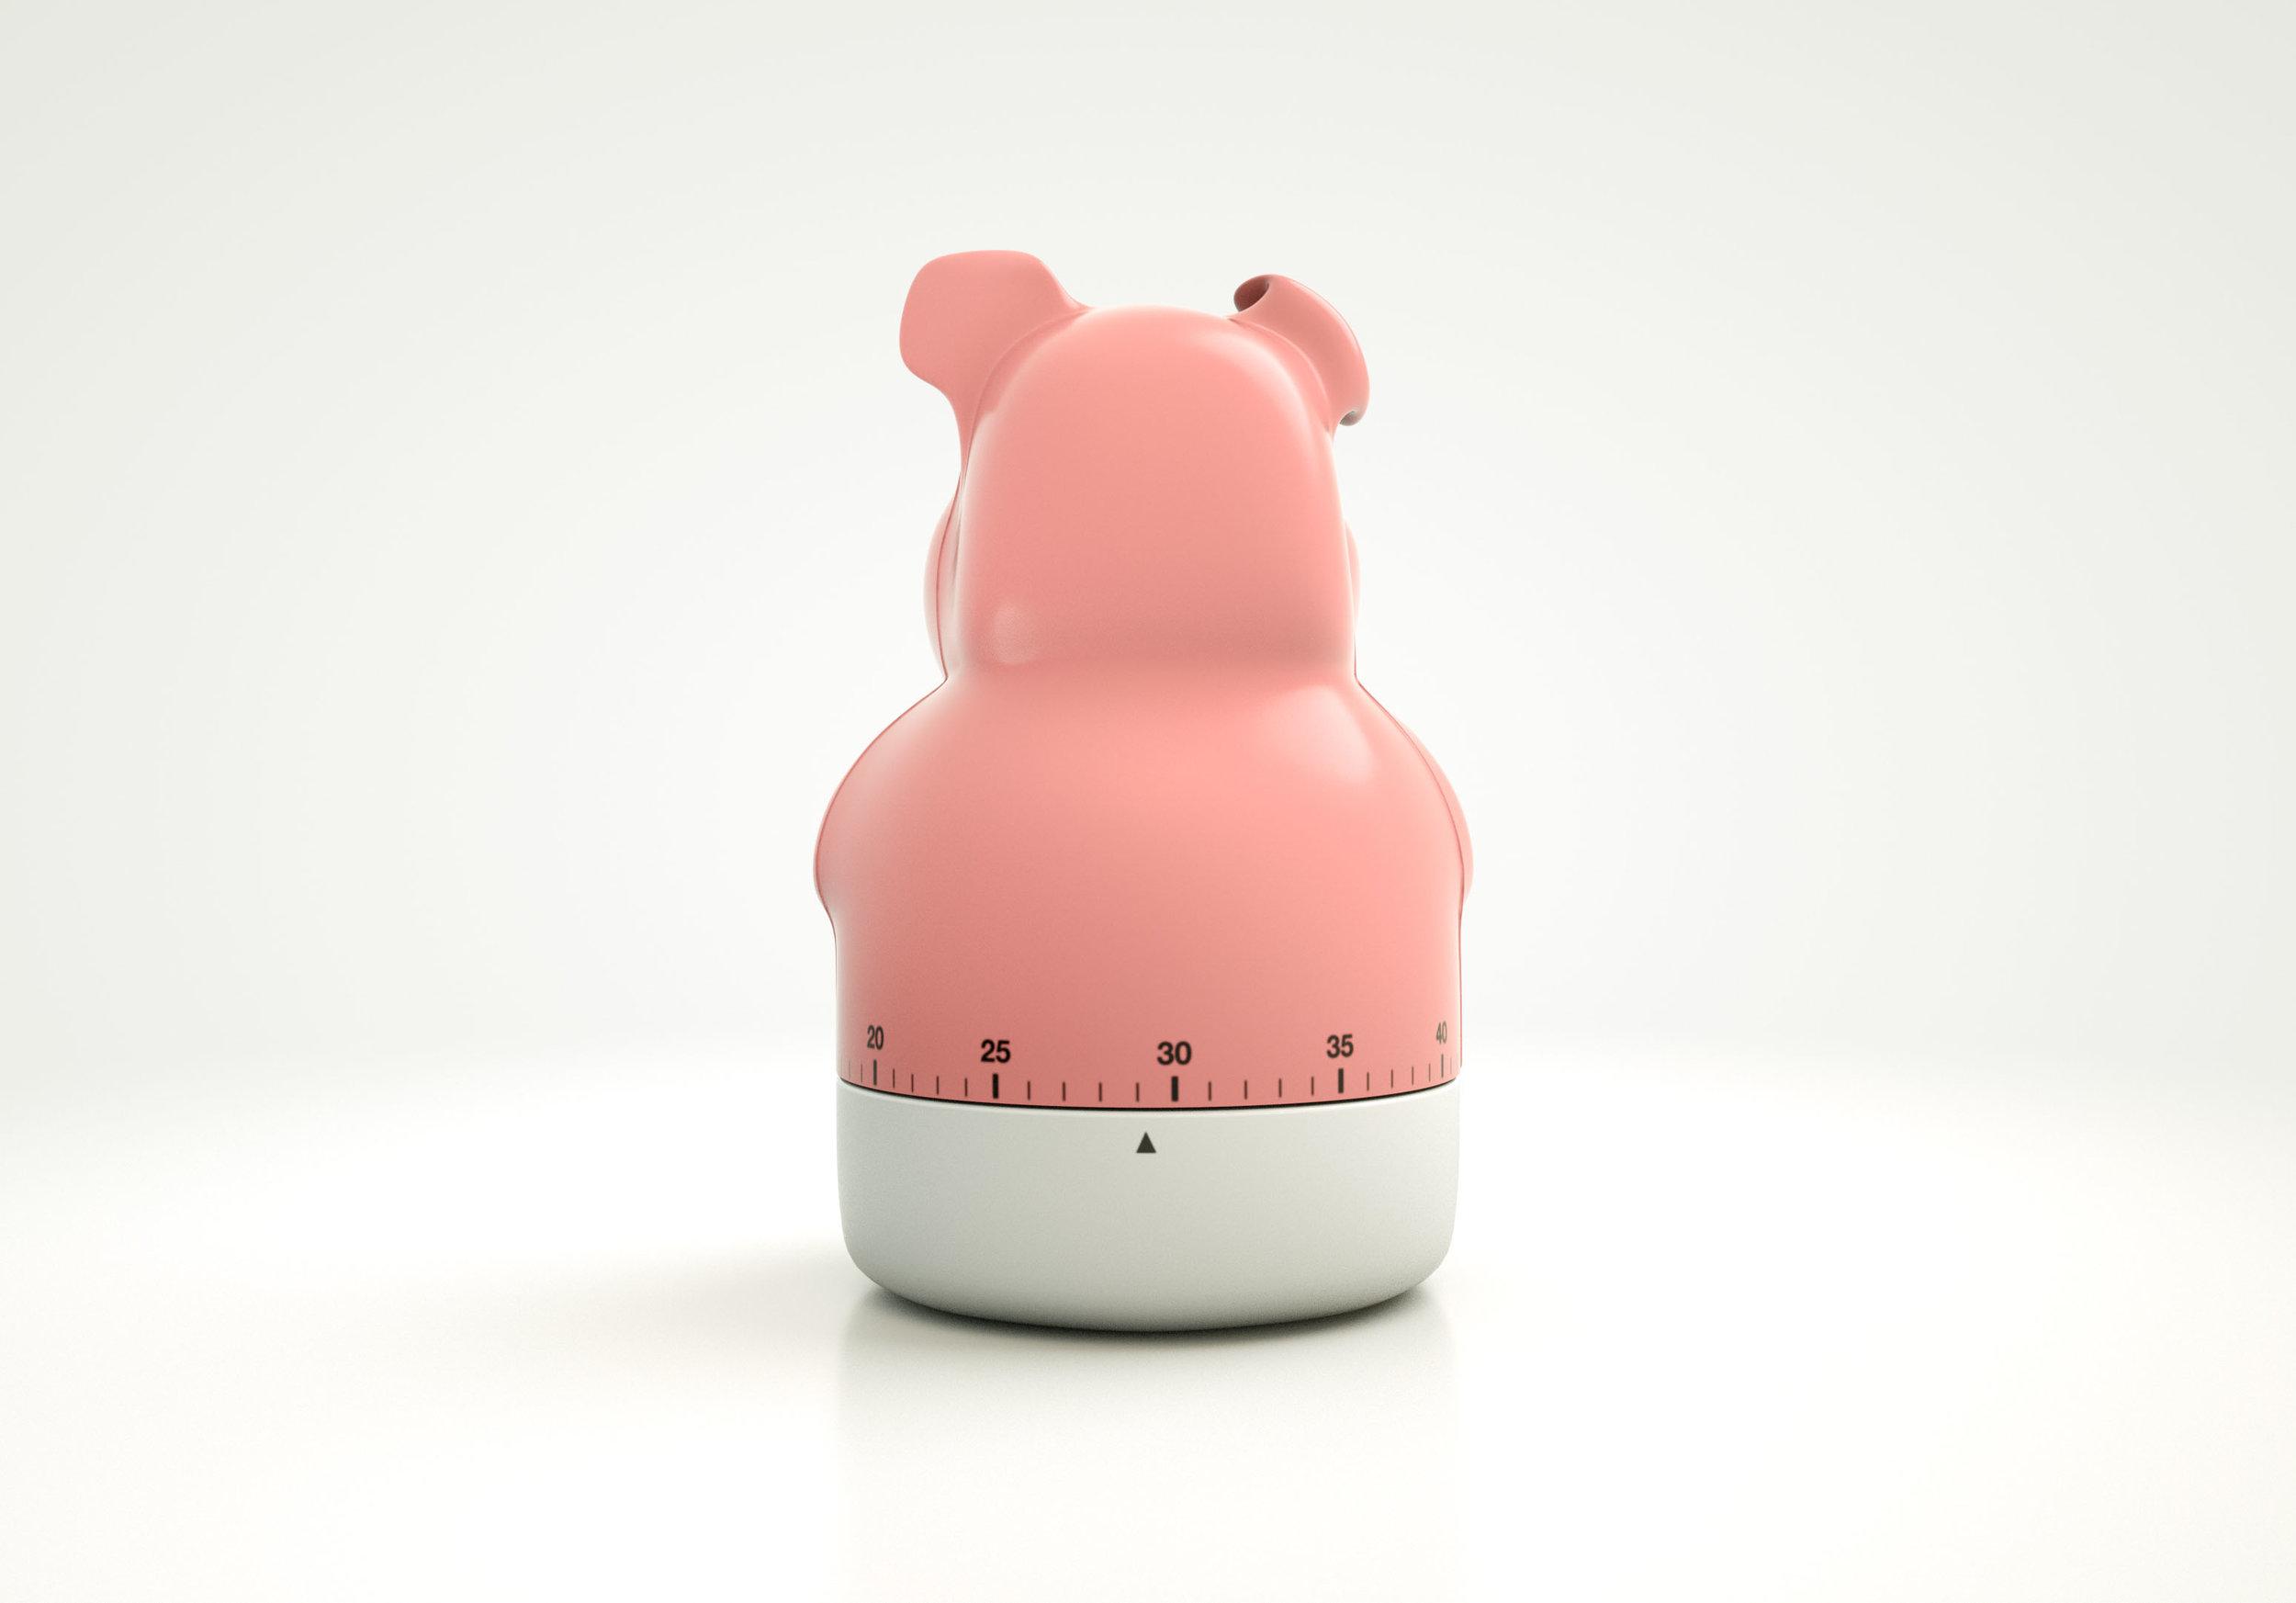 PIG_006_0000_0003_PIG_006_0708.jpg